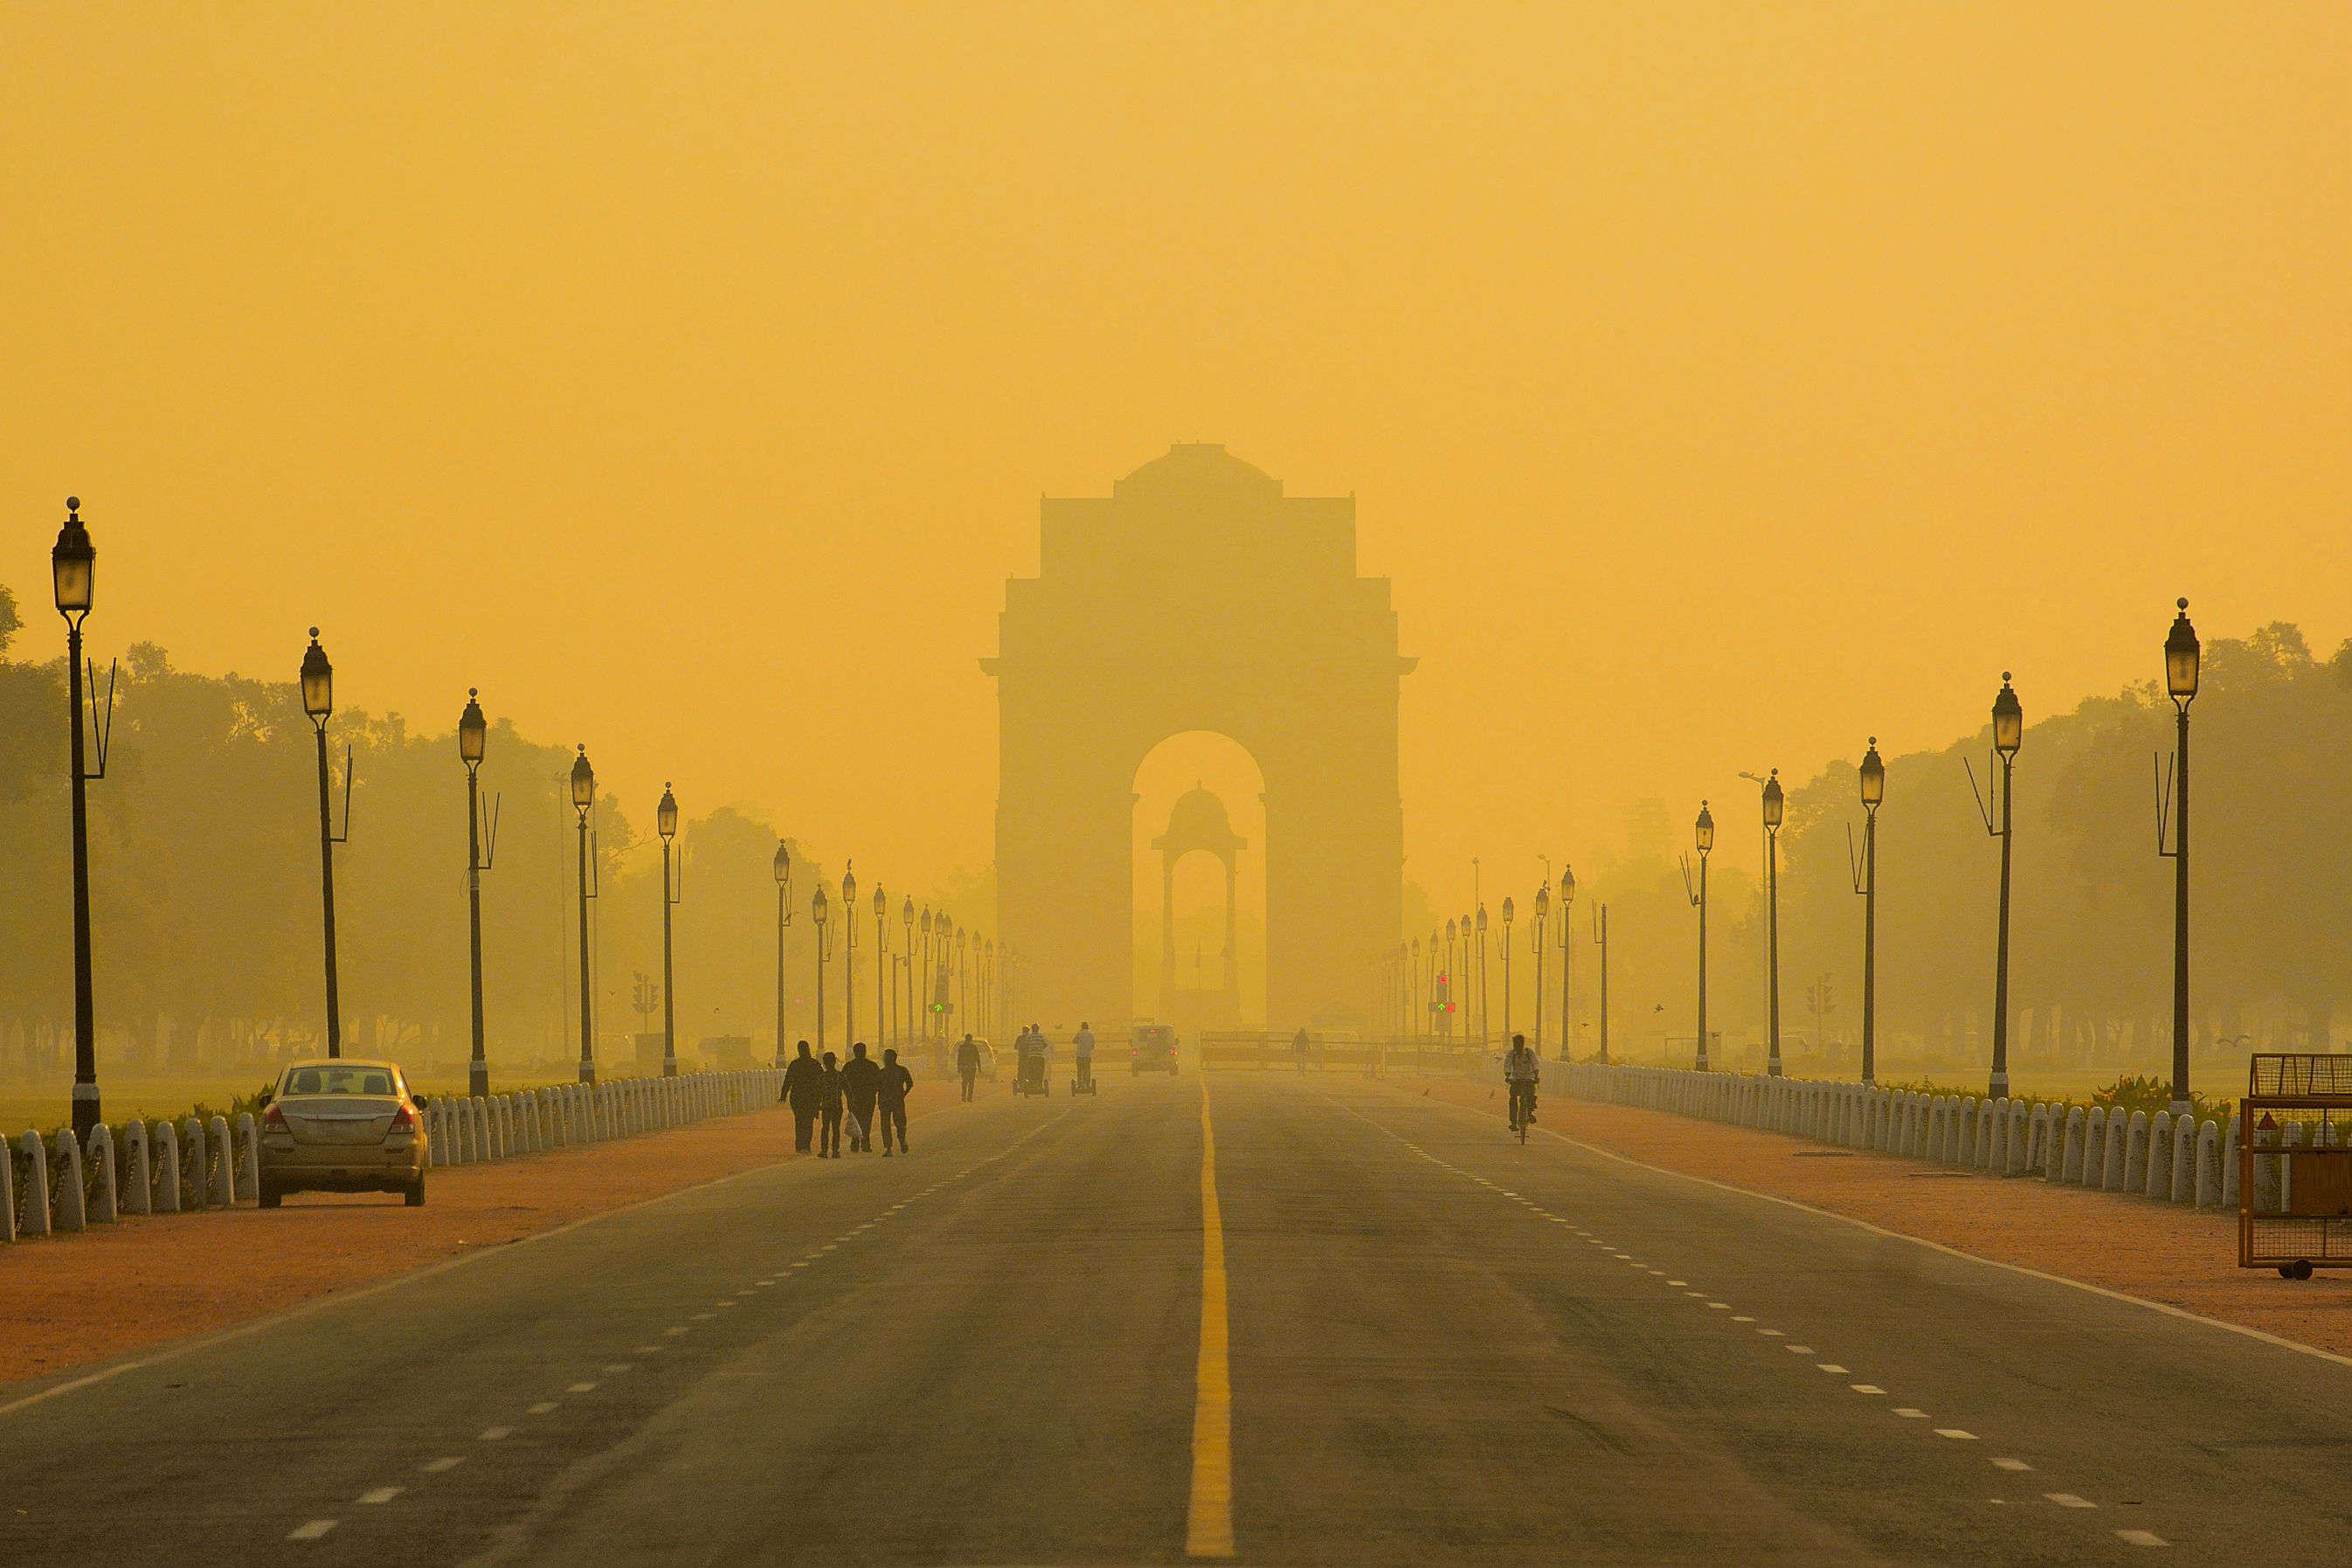 Hotels near Central Delhi for a delightful Delhi experience